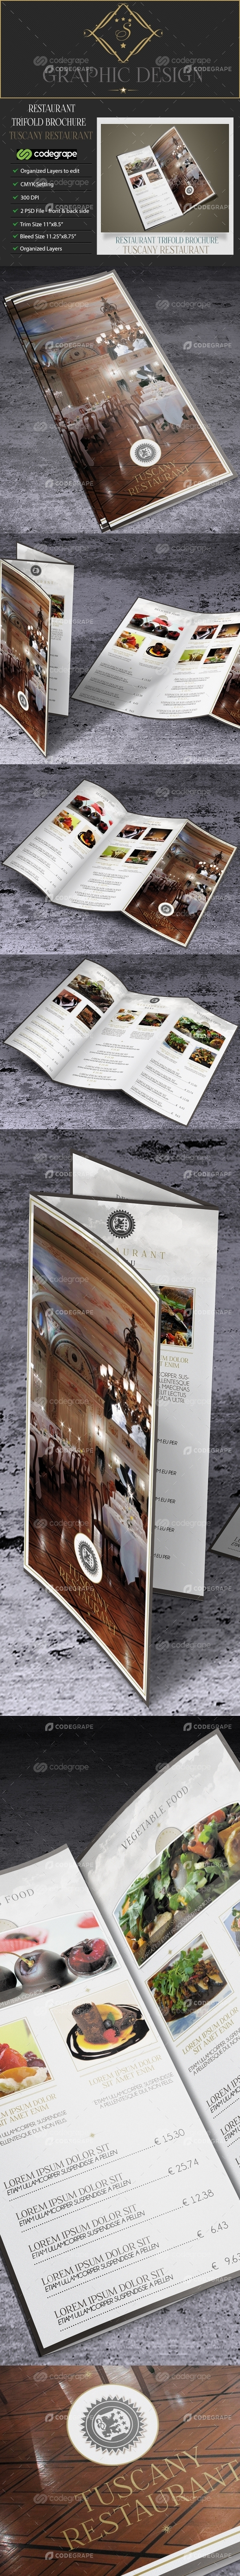 Restaurant TriFold Brochure Tuscany